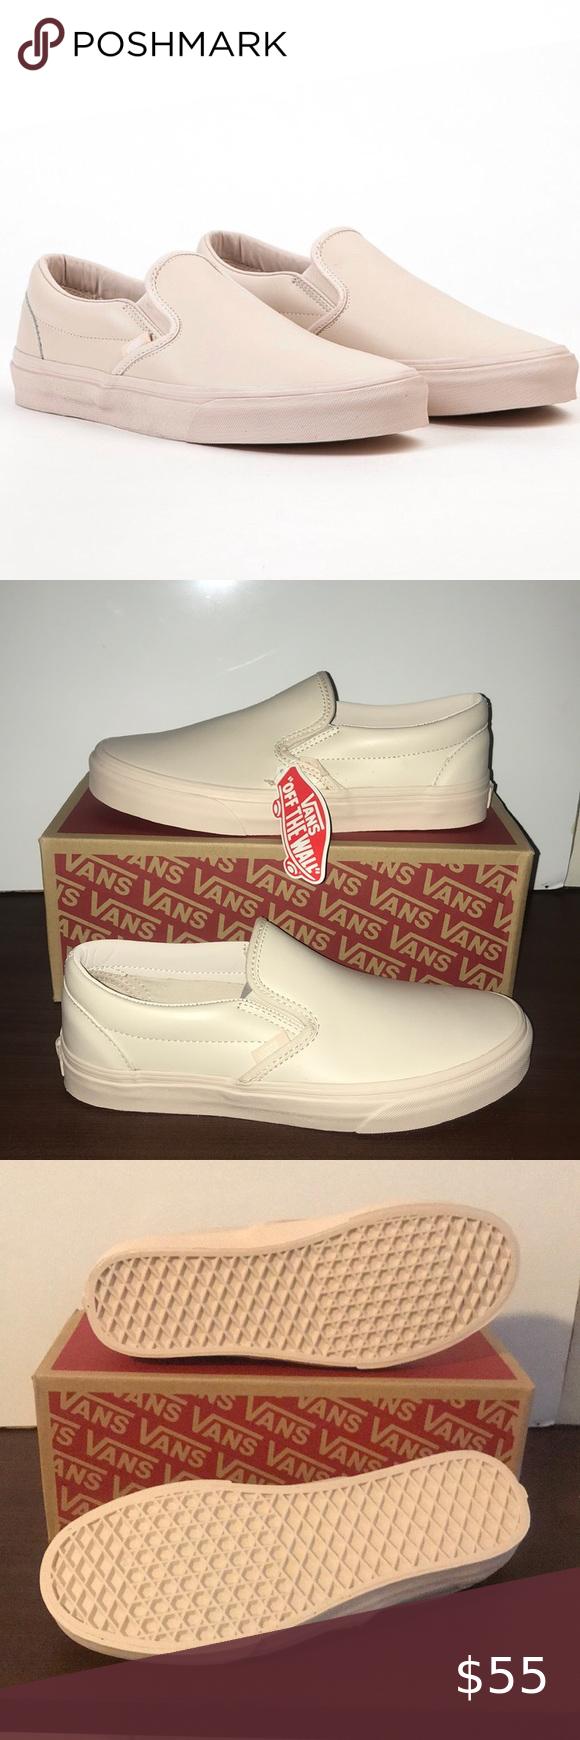 542014fcb1 Vans Classic Slip-On Vans Classic Slip-On Leather Whisper Pink Mono Brand  🆕 Vans Shoes